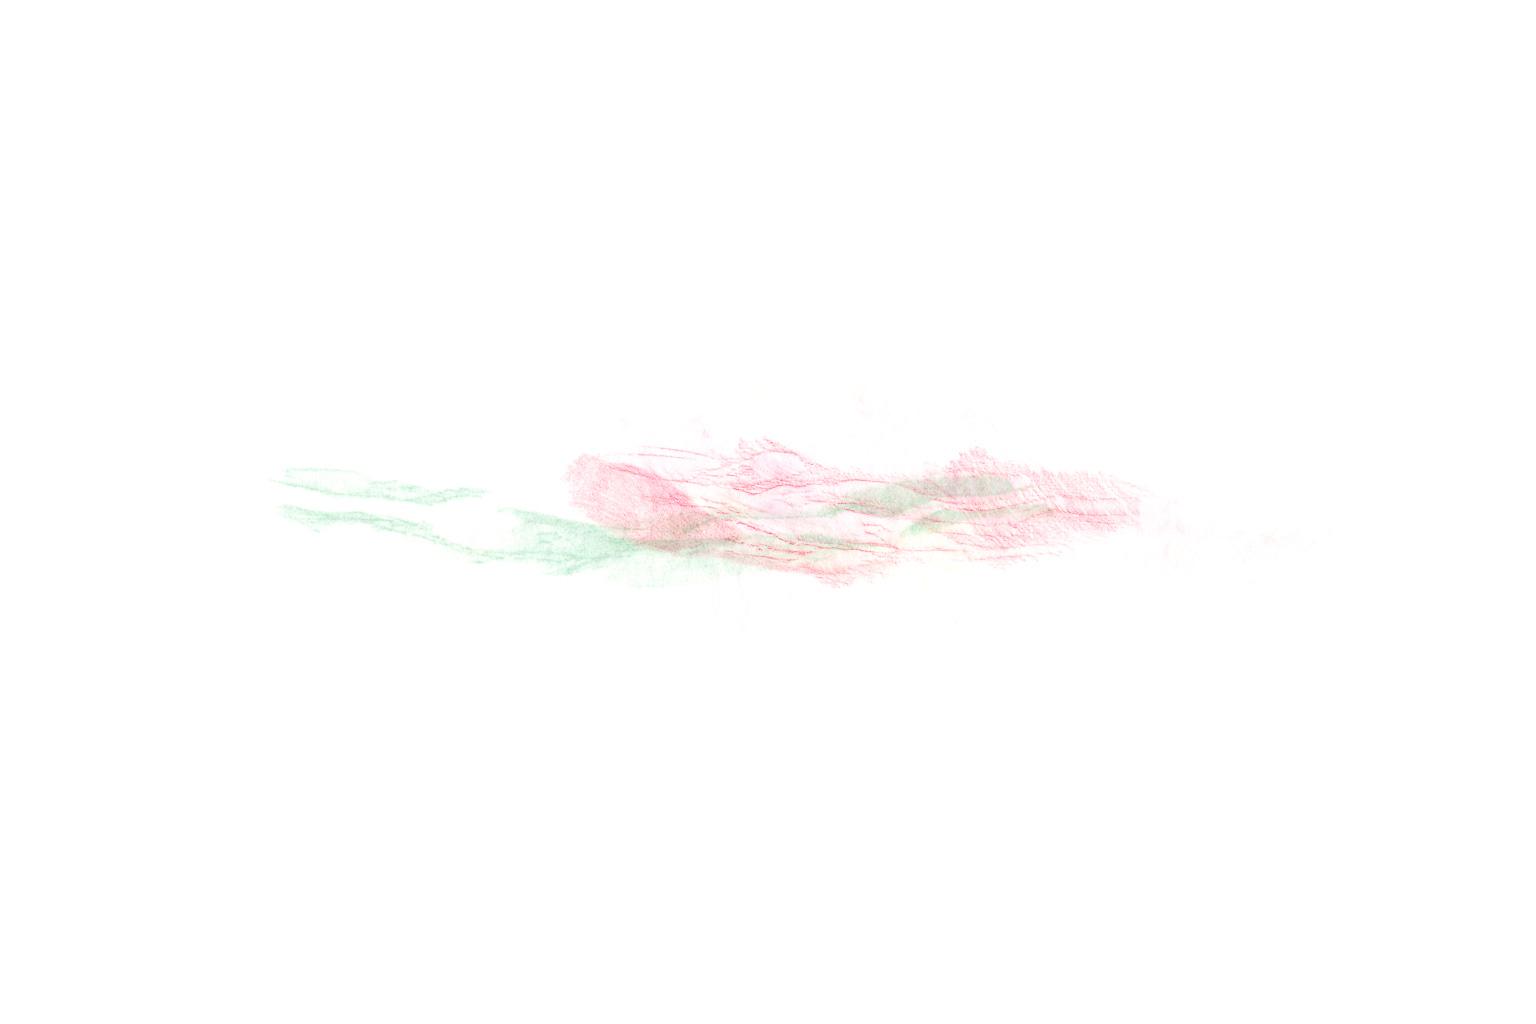 Dessin_Ligne_Horizon_page_02